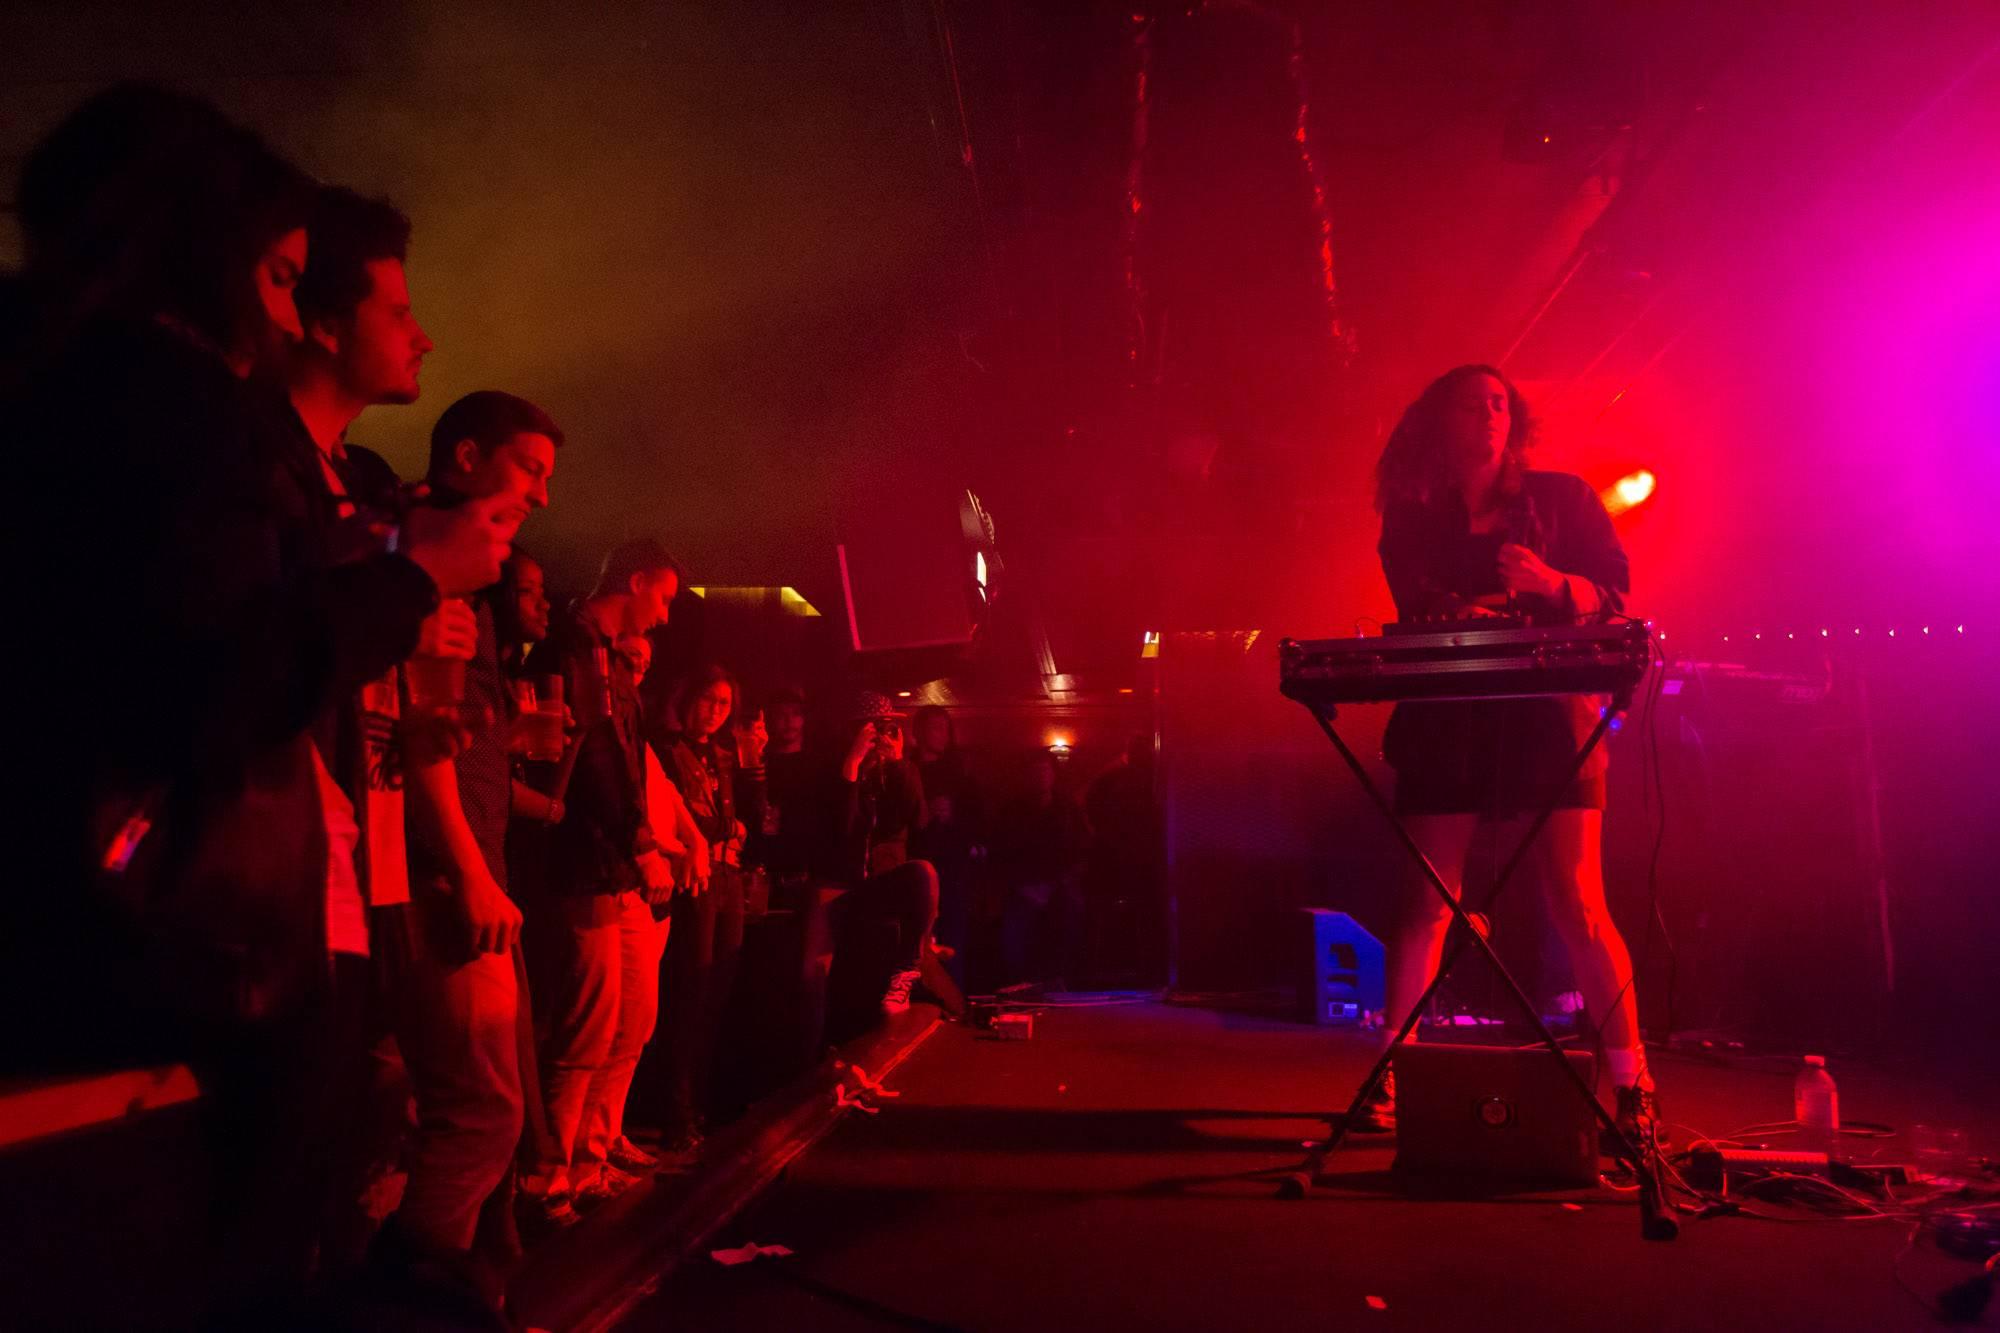 Empress Of at the Biltmore Cabaret, Vancouver, Sept 25 2015. Kirk Chantraine photo.